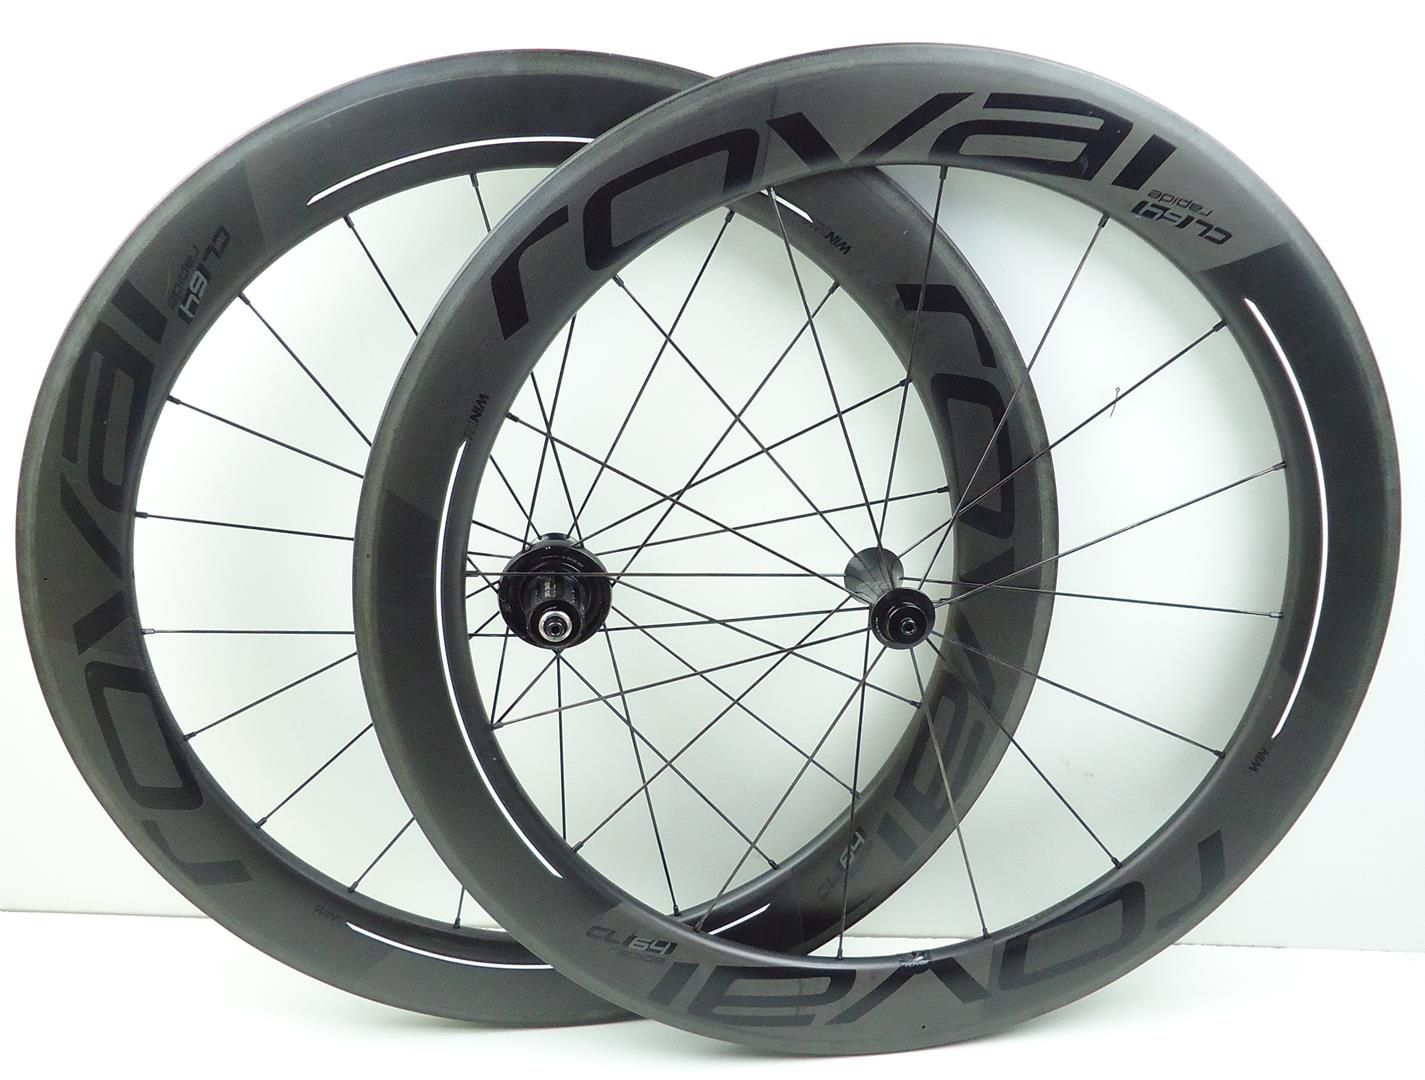 Rodas Bicicleta Speed Roval Rapide CL 64 Carbono Tubeless Aro 700 Clincher - USADO